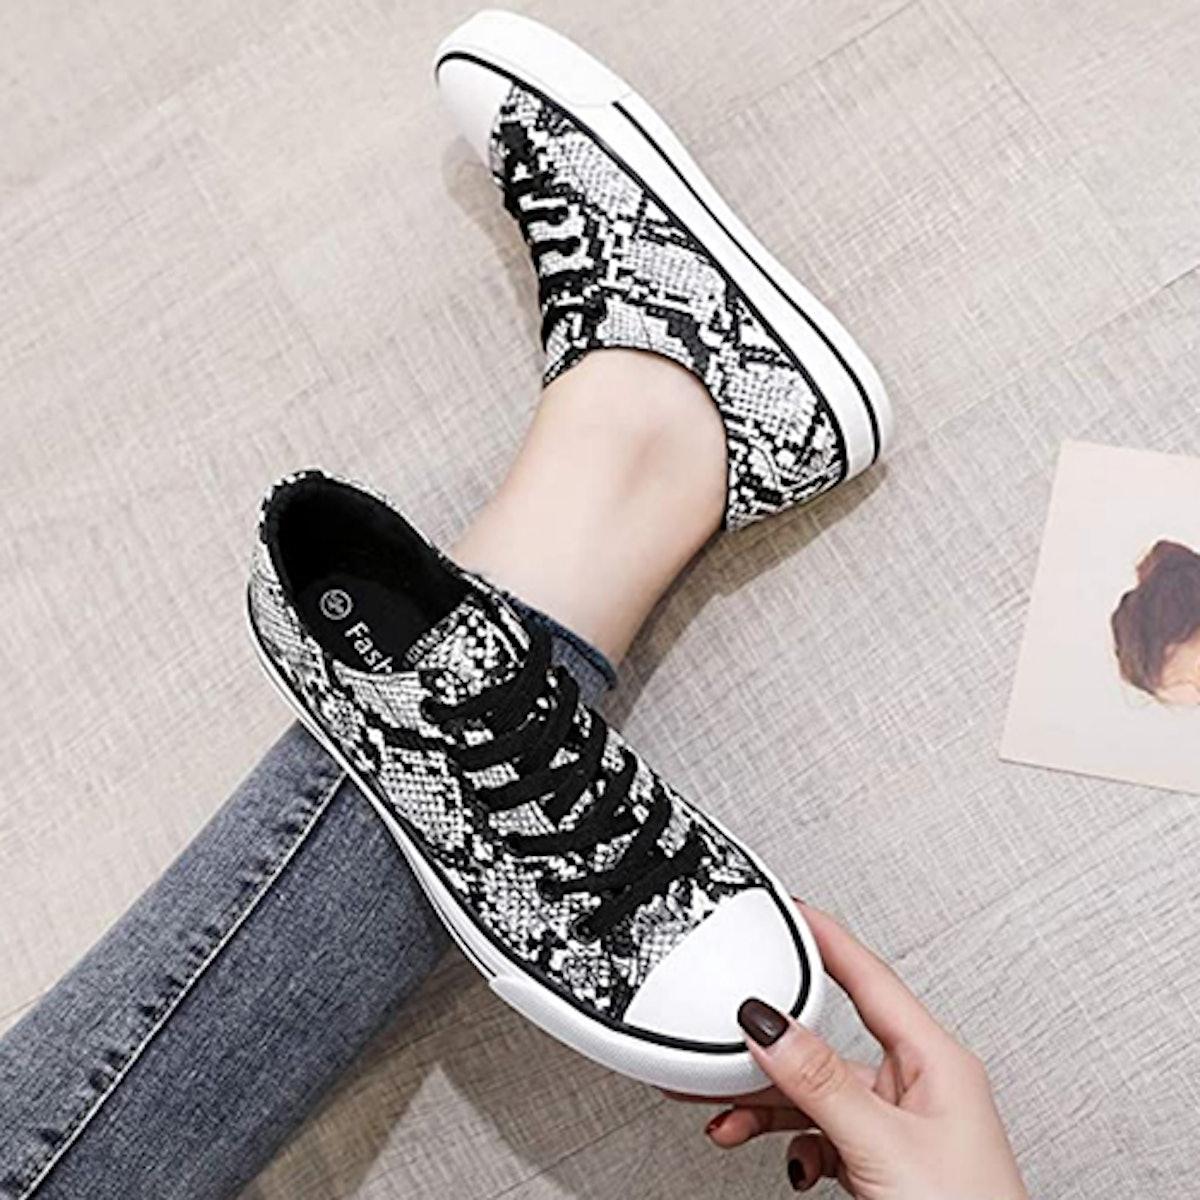 AOMAIS Low Top Sneakers